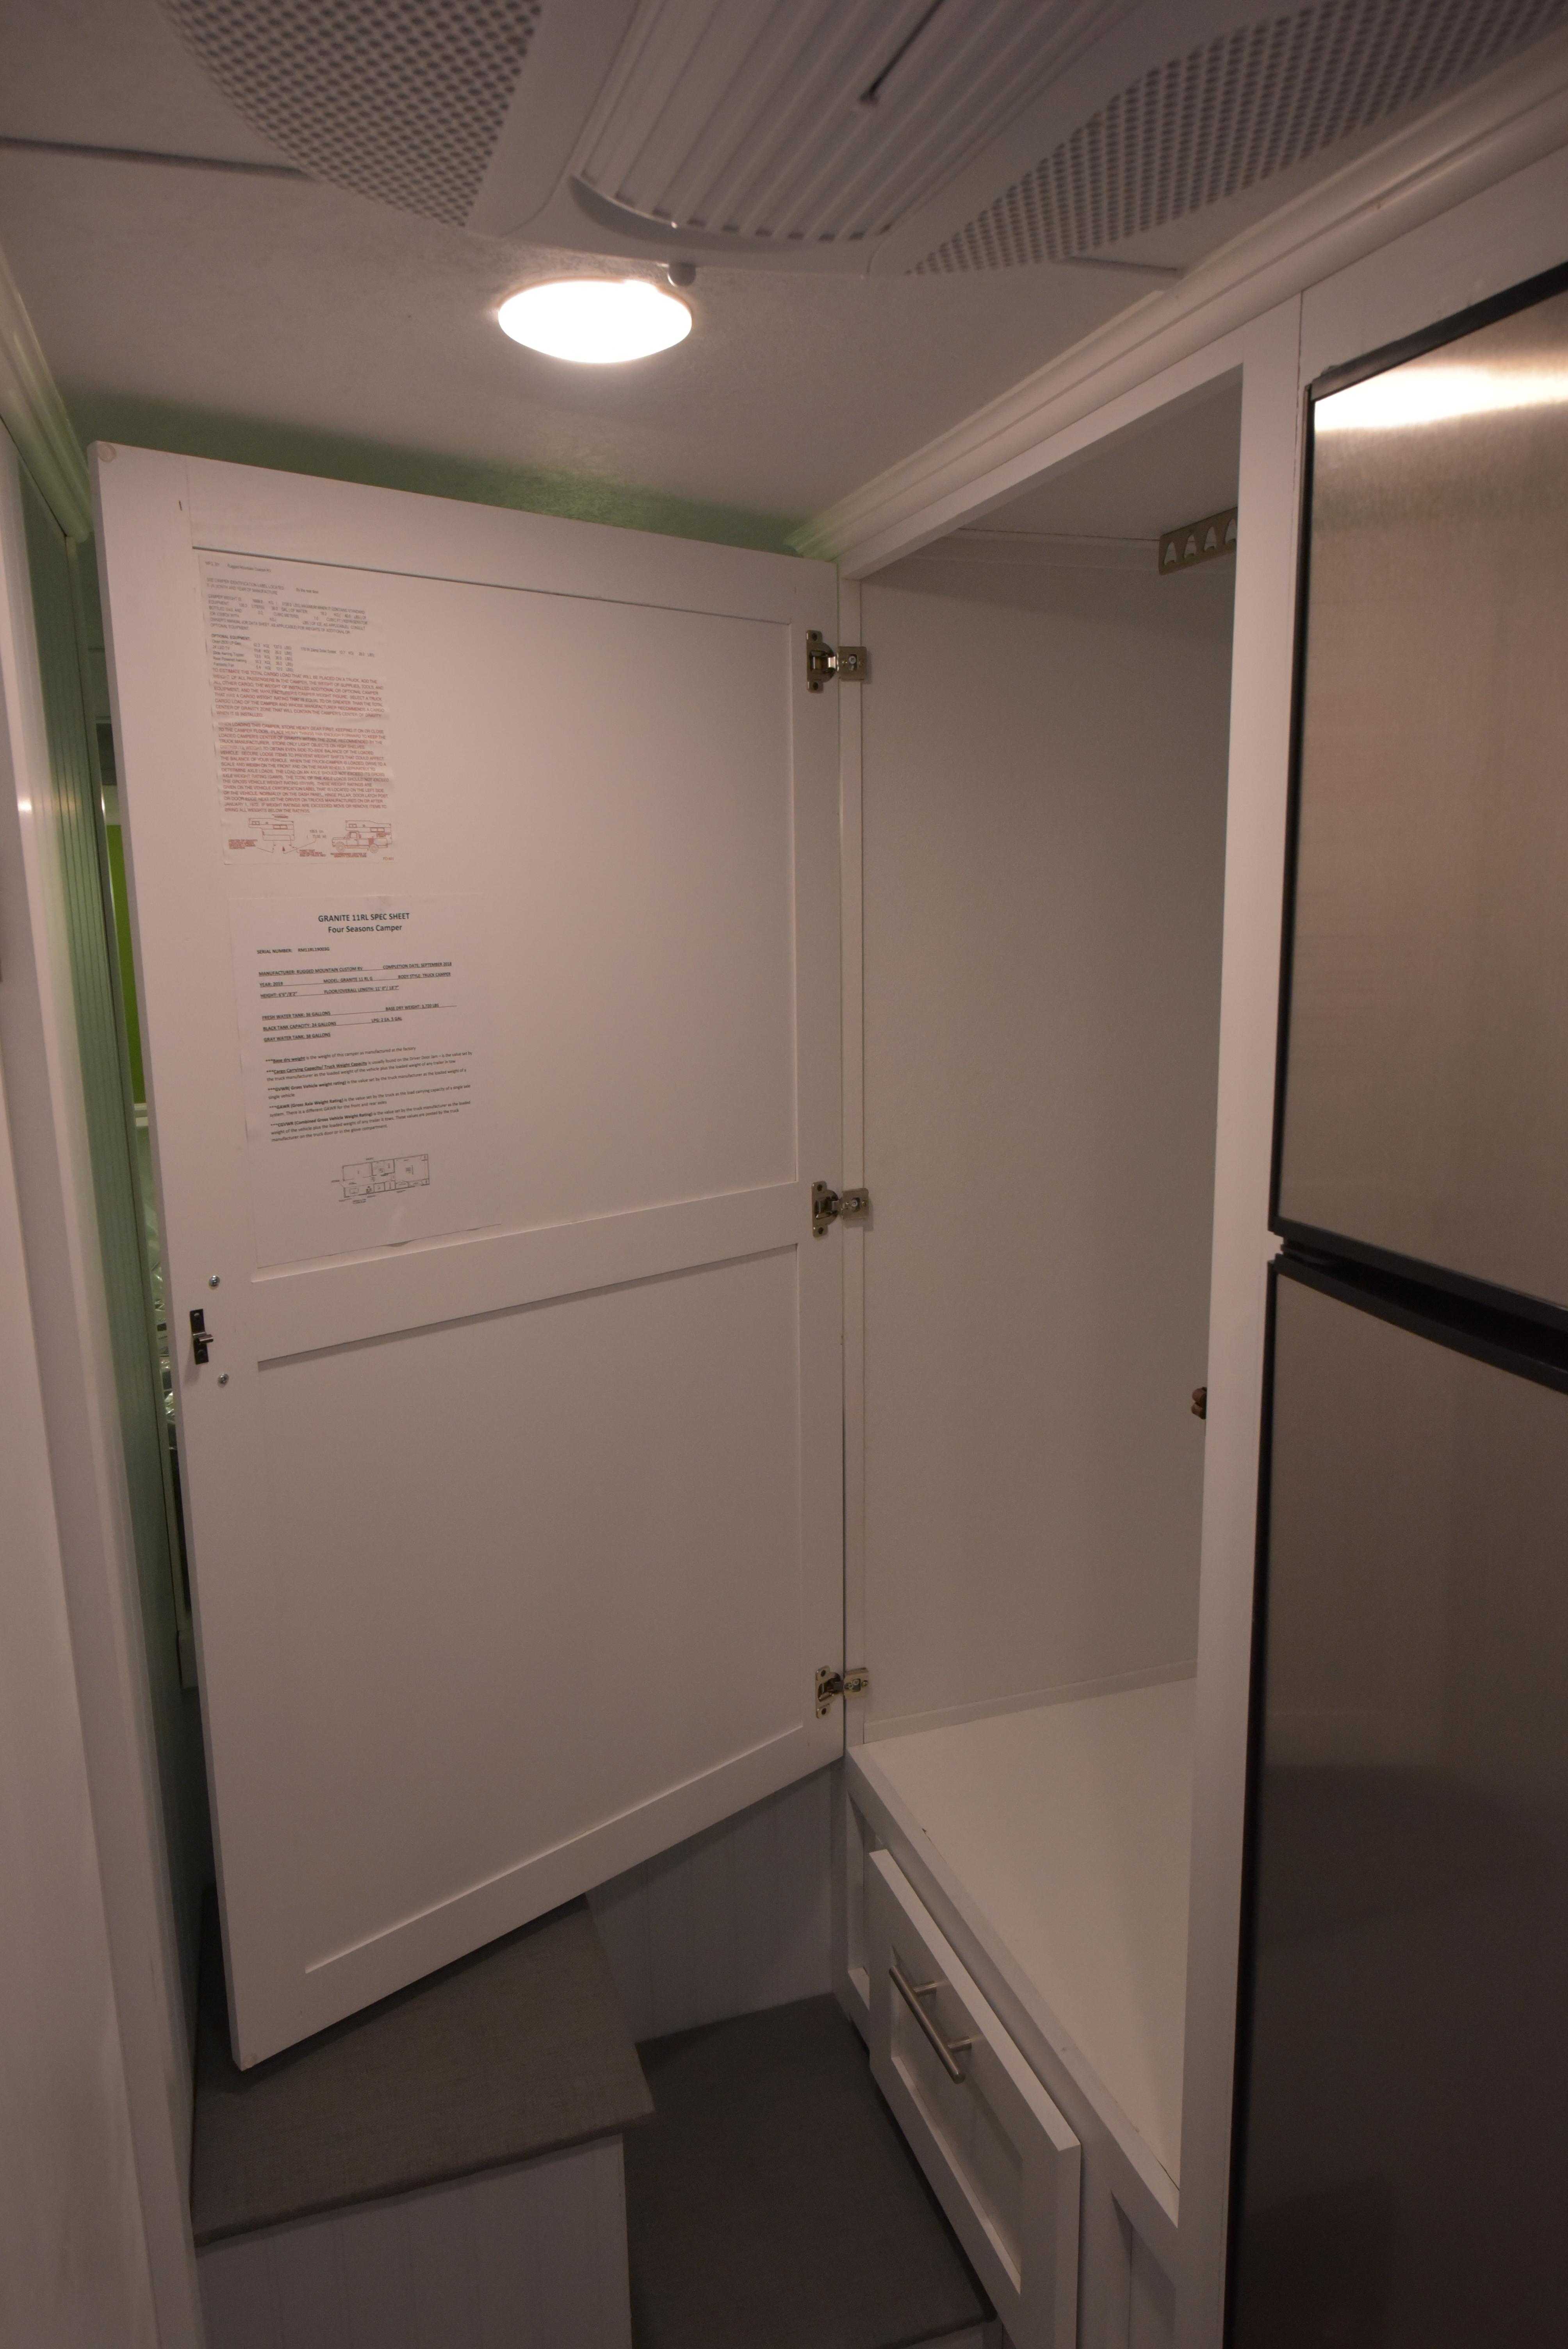 2019 Granite 11RL Closet Door